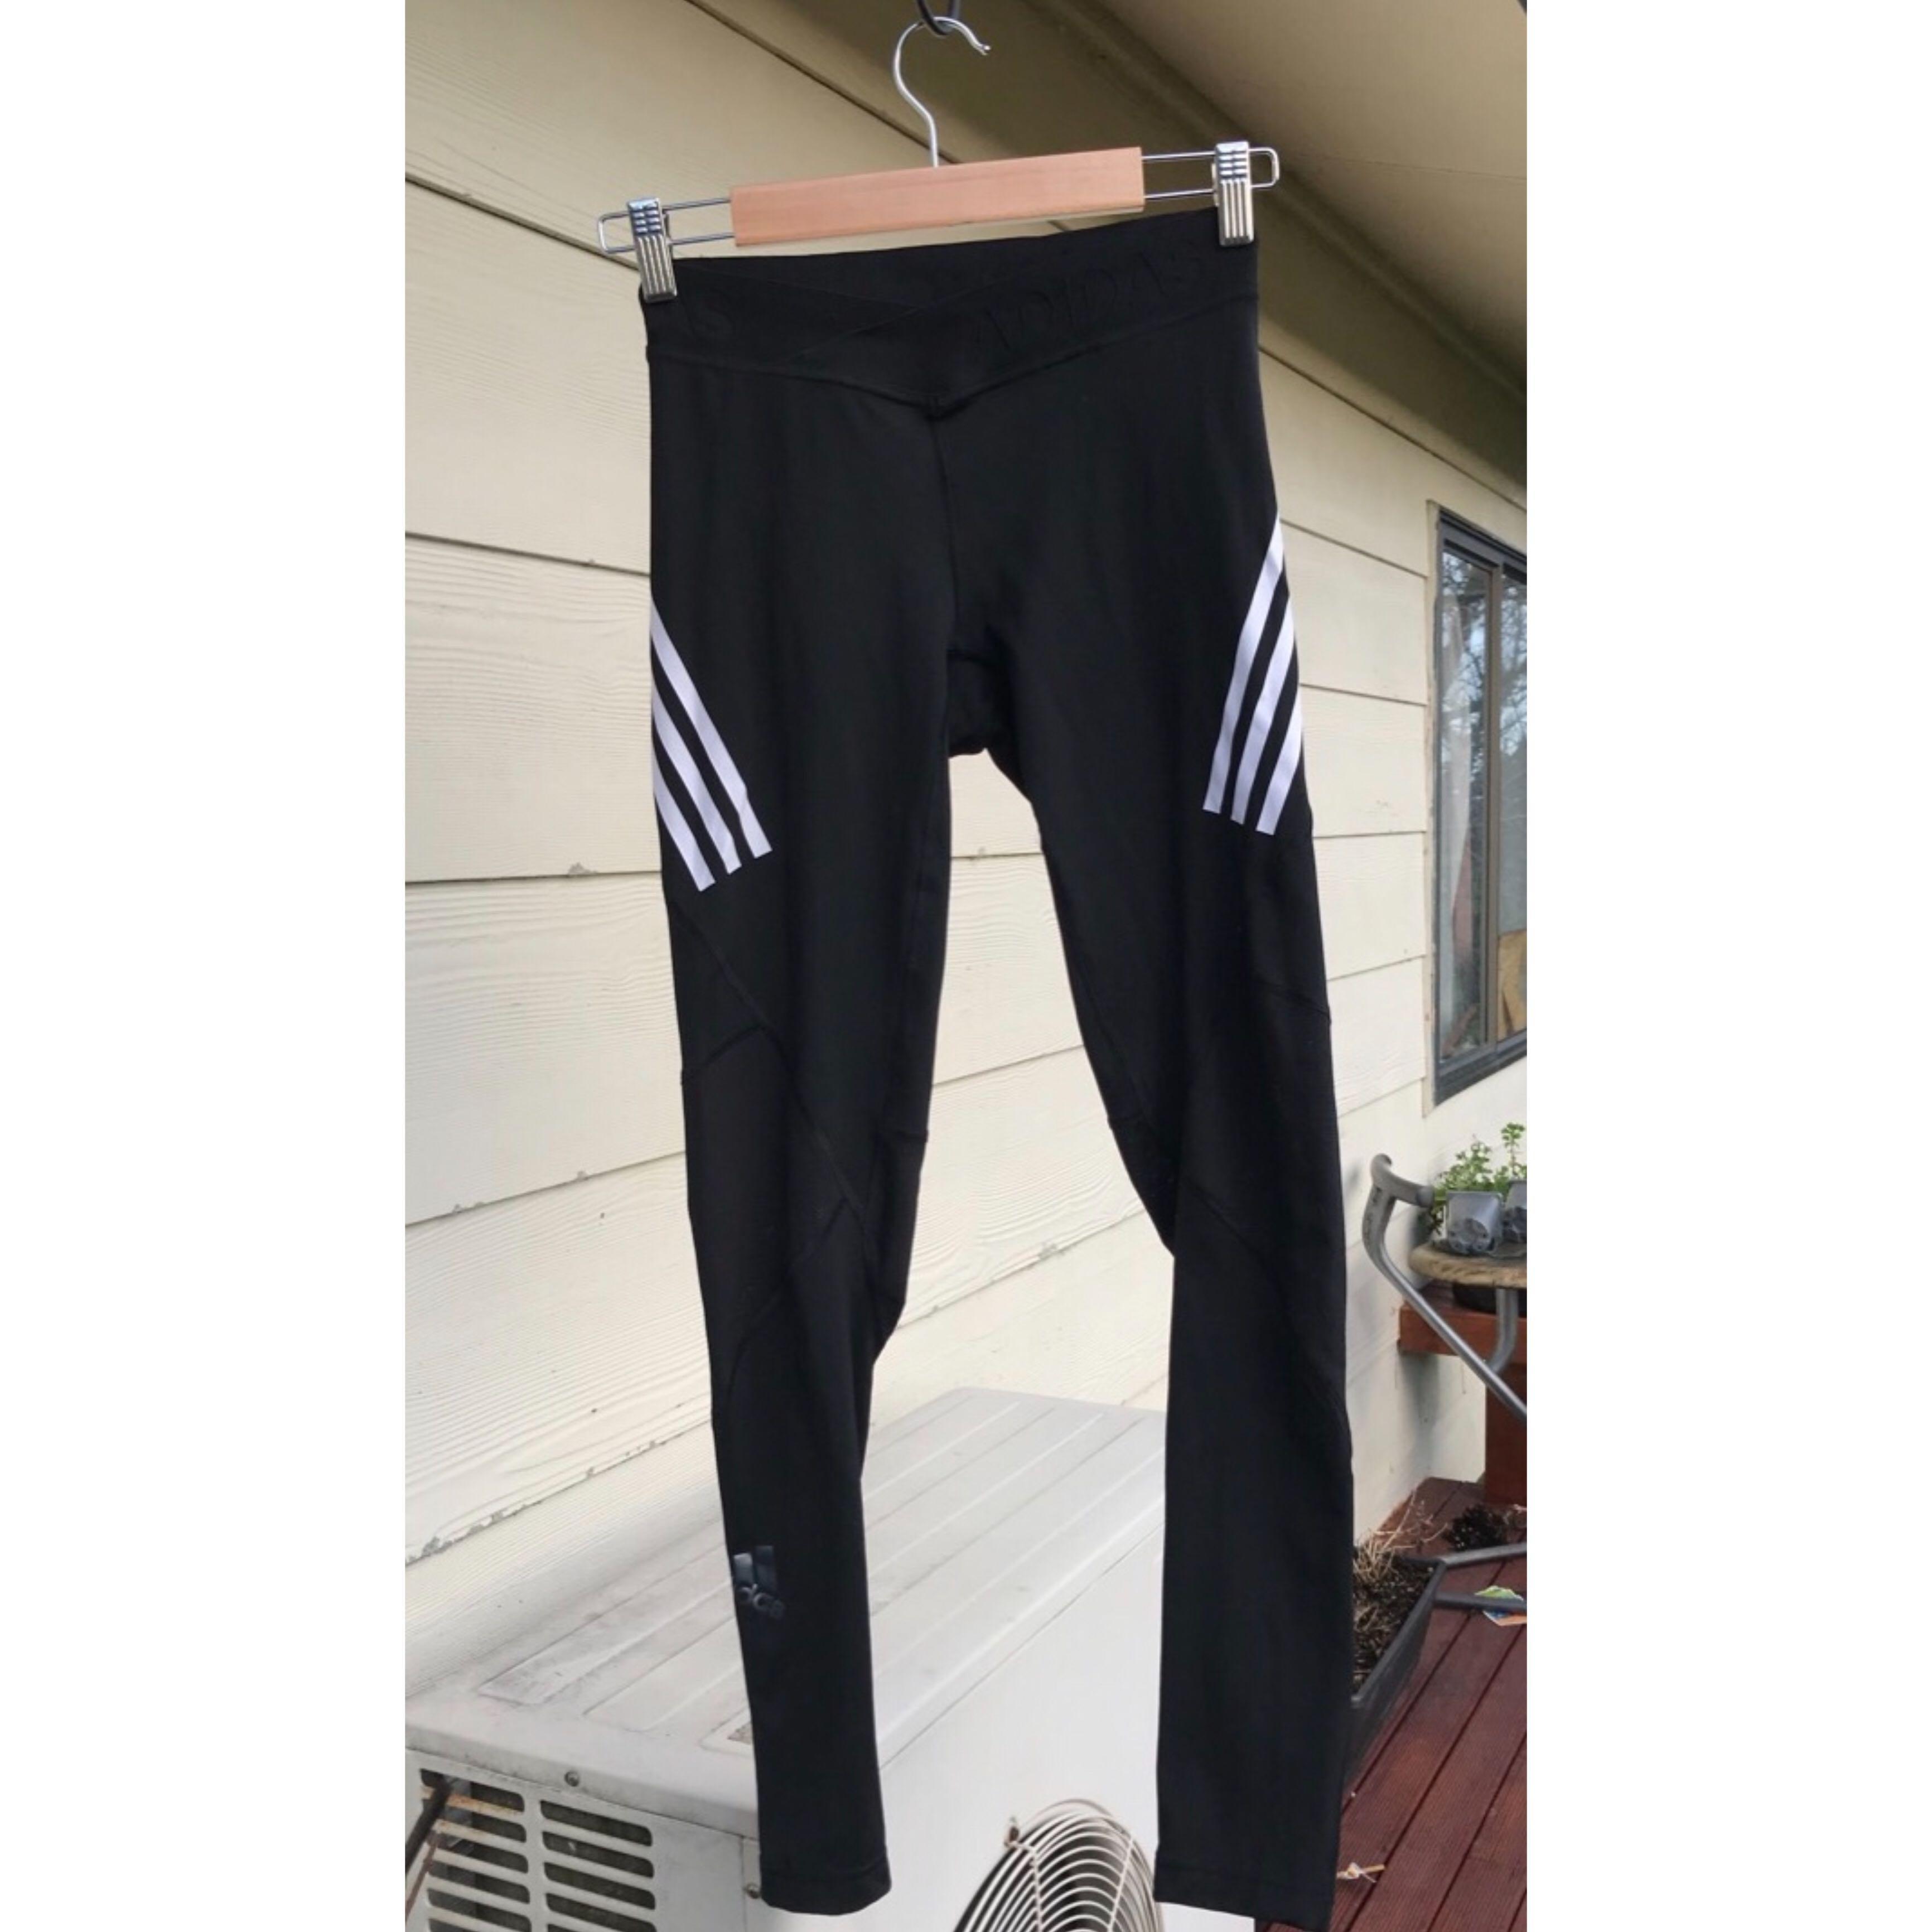 Adidas Alphaskin Sport 3-Stripes Long Tights